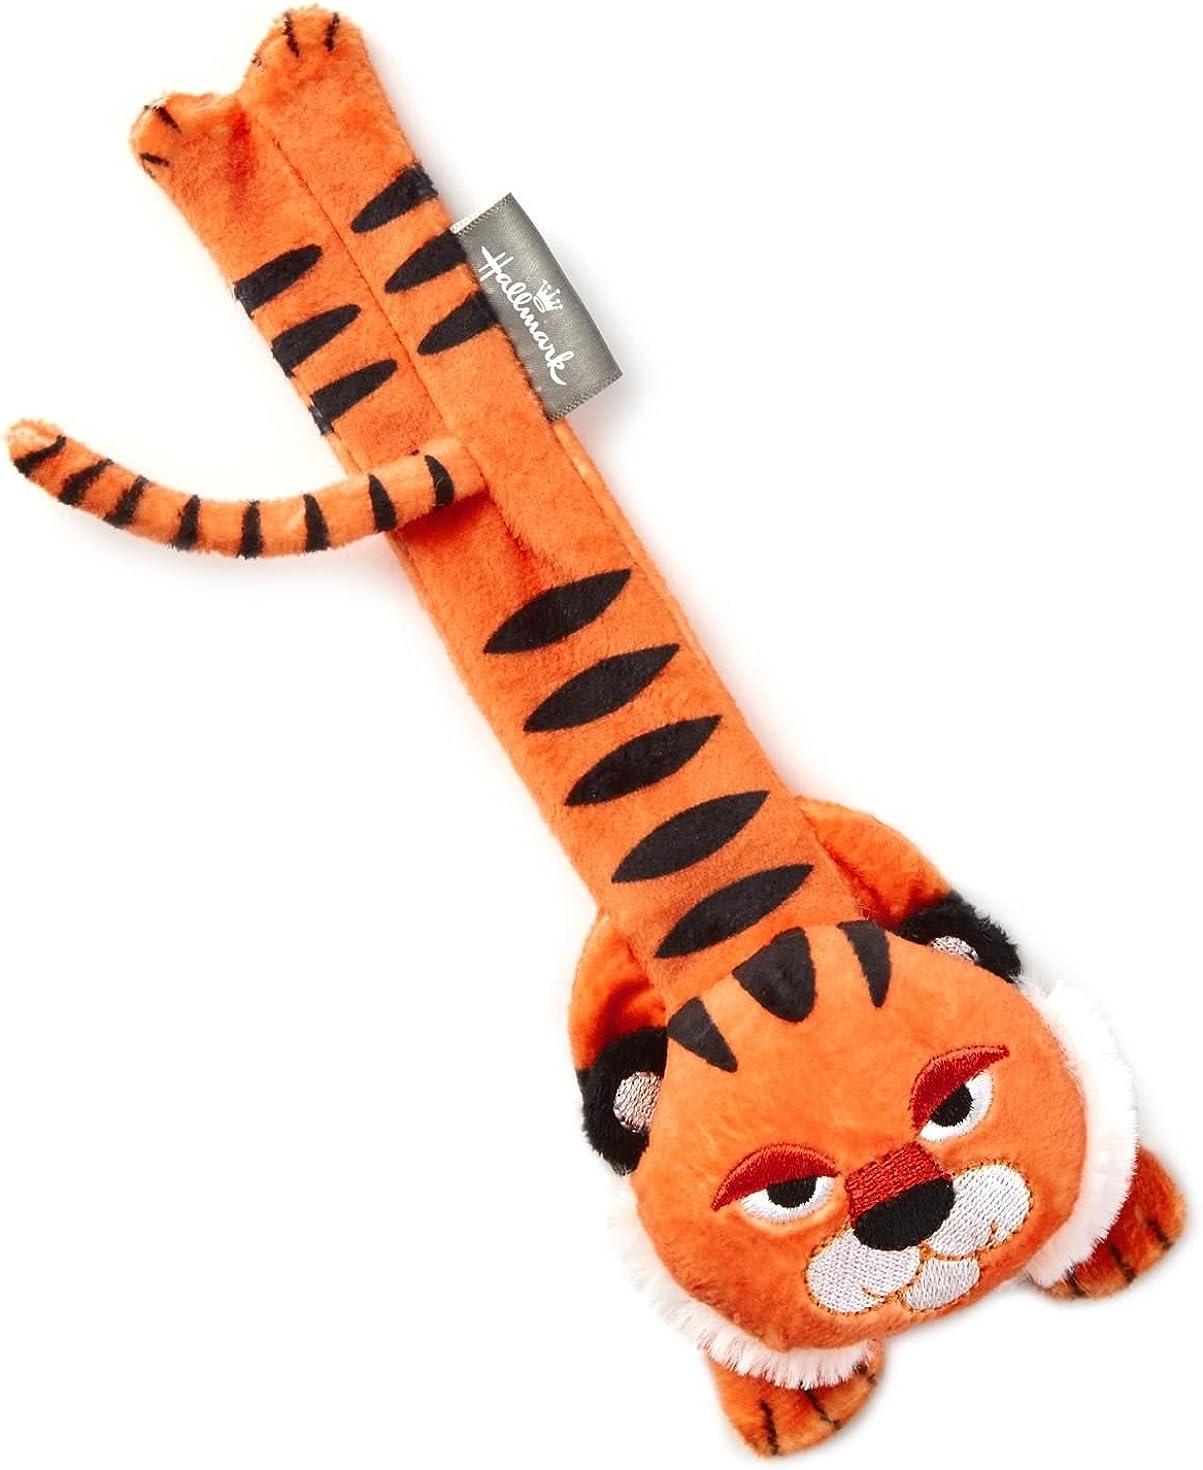 Best Stuffed Animals For Boy, Amazon Com Hallmark Snappums Theo Tiger Stuffed Animal Slap Bracelet Plush Toys Clothing